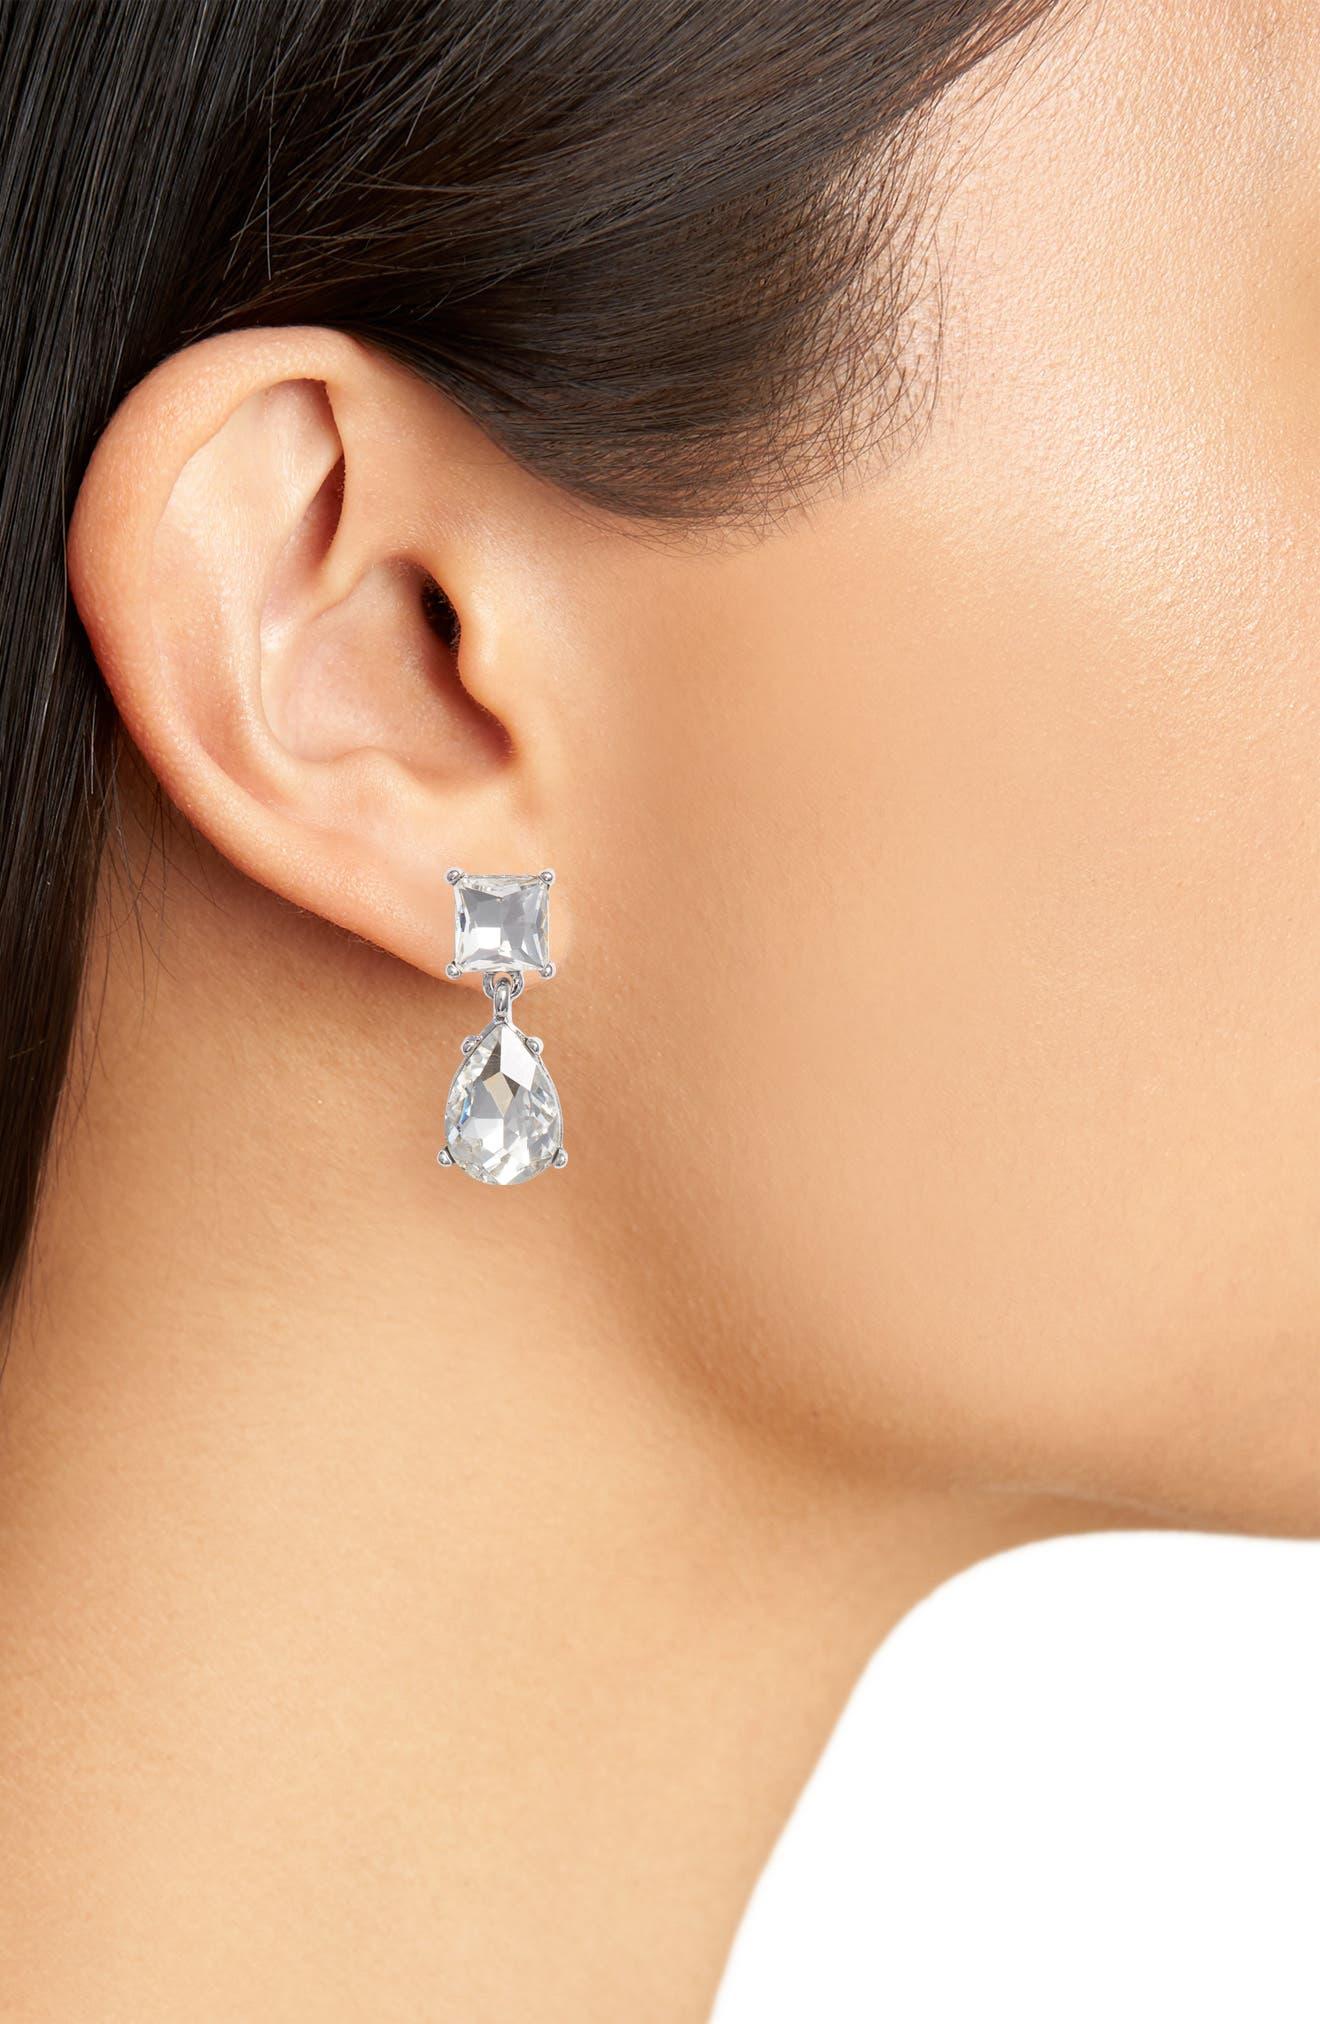 Princess Double Drop Earrings,                             Alternate thumbnail 2, color,                             CLEAR- RHODIUM